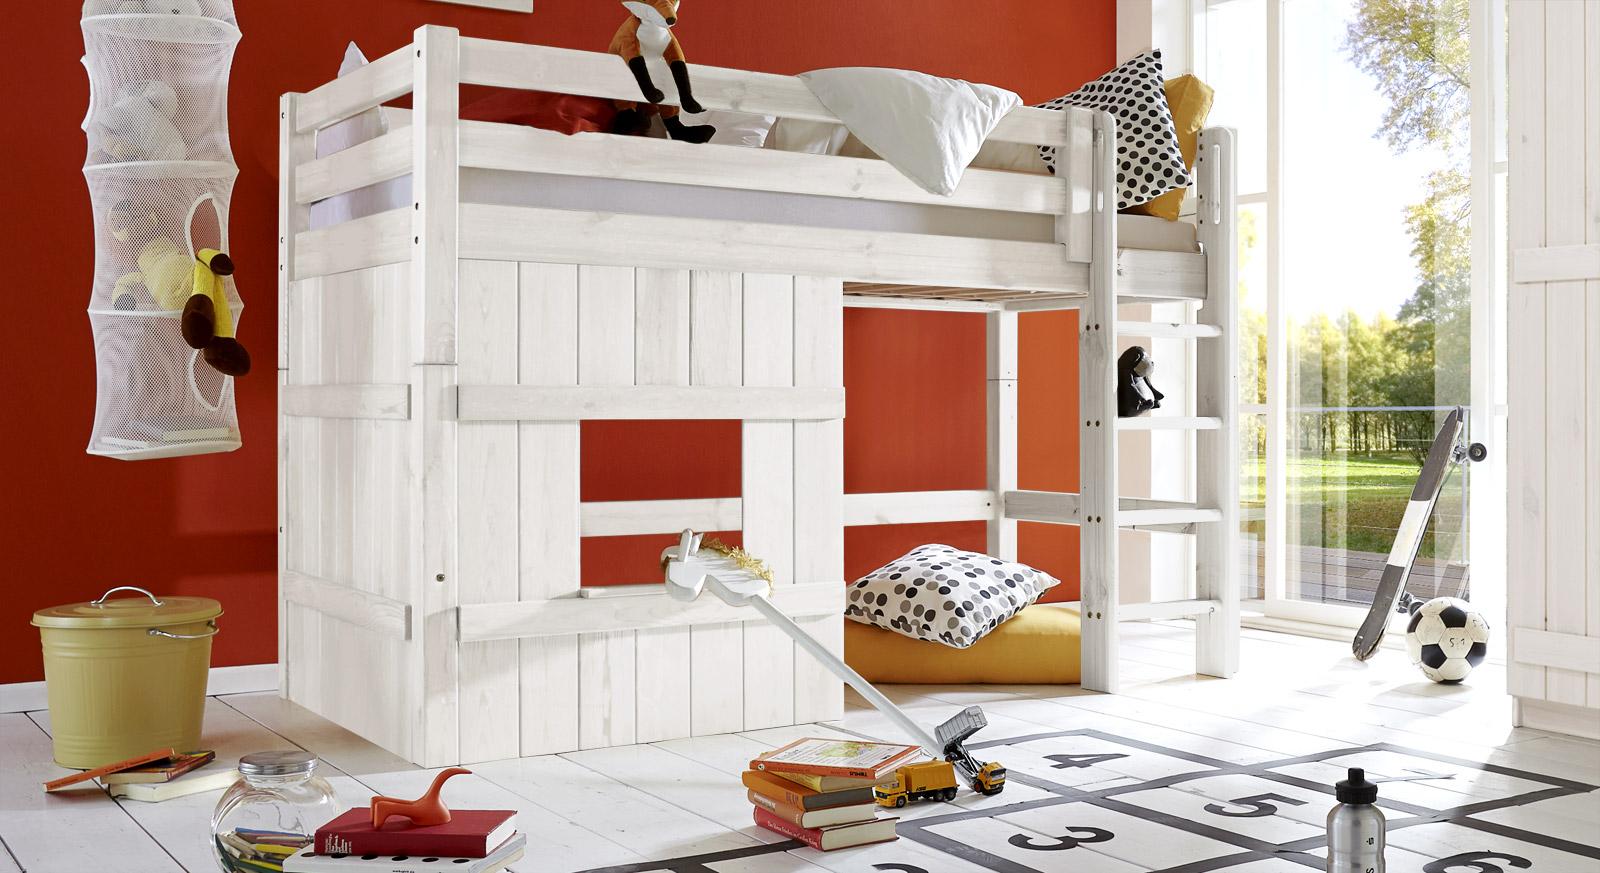 h tten hochbett mit spielhaus aus kiefer kids paradise basic. Black Bedroom Furniture Sets. Home Design Ideas